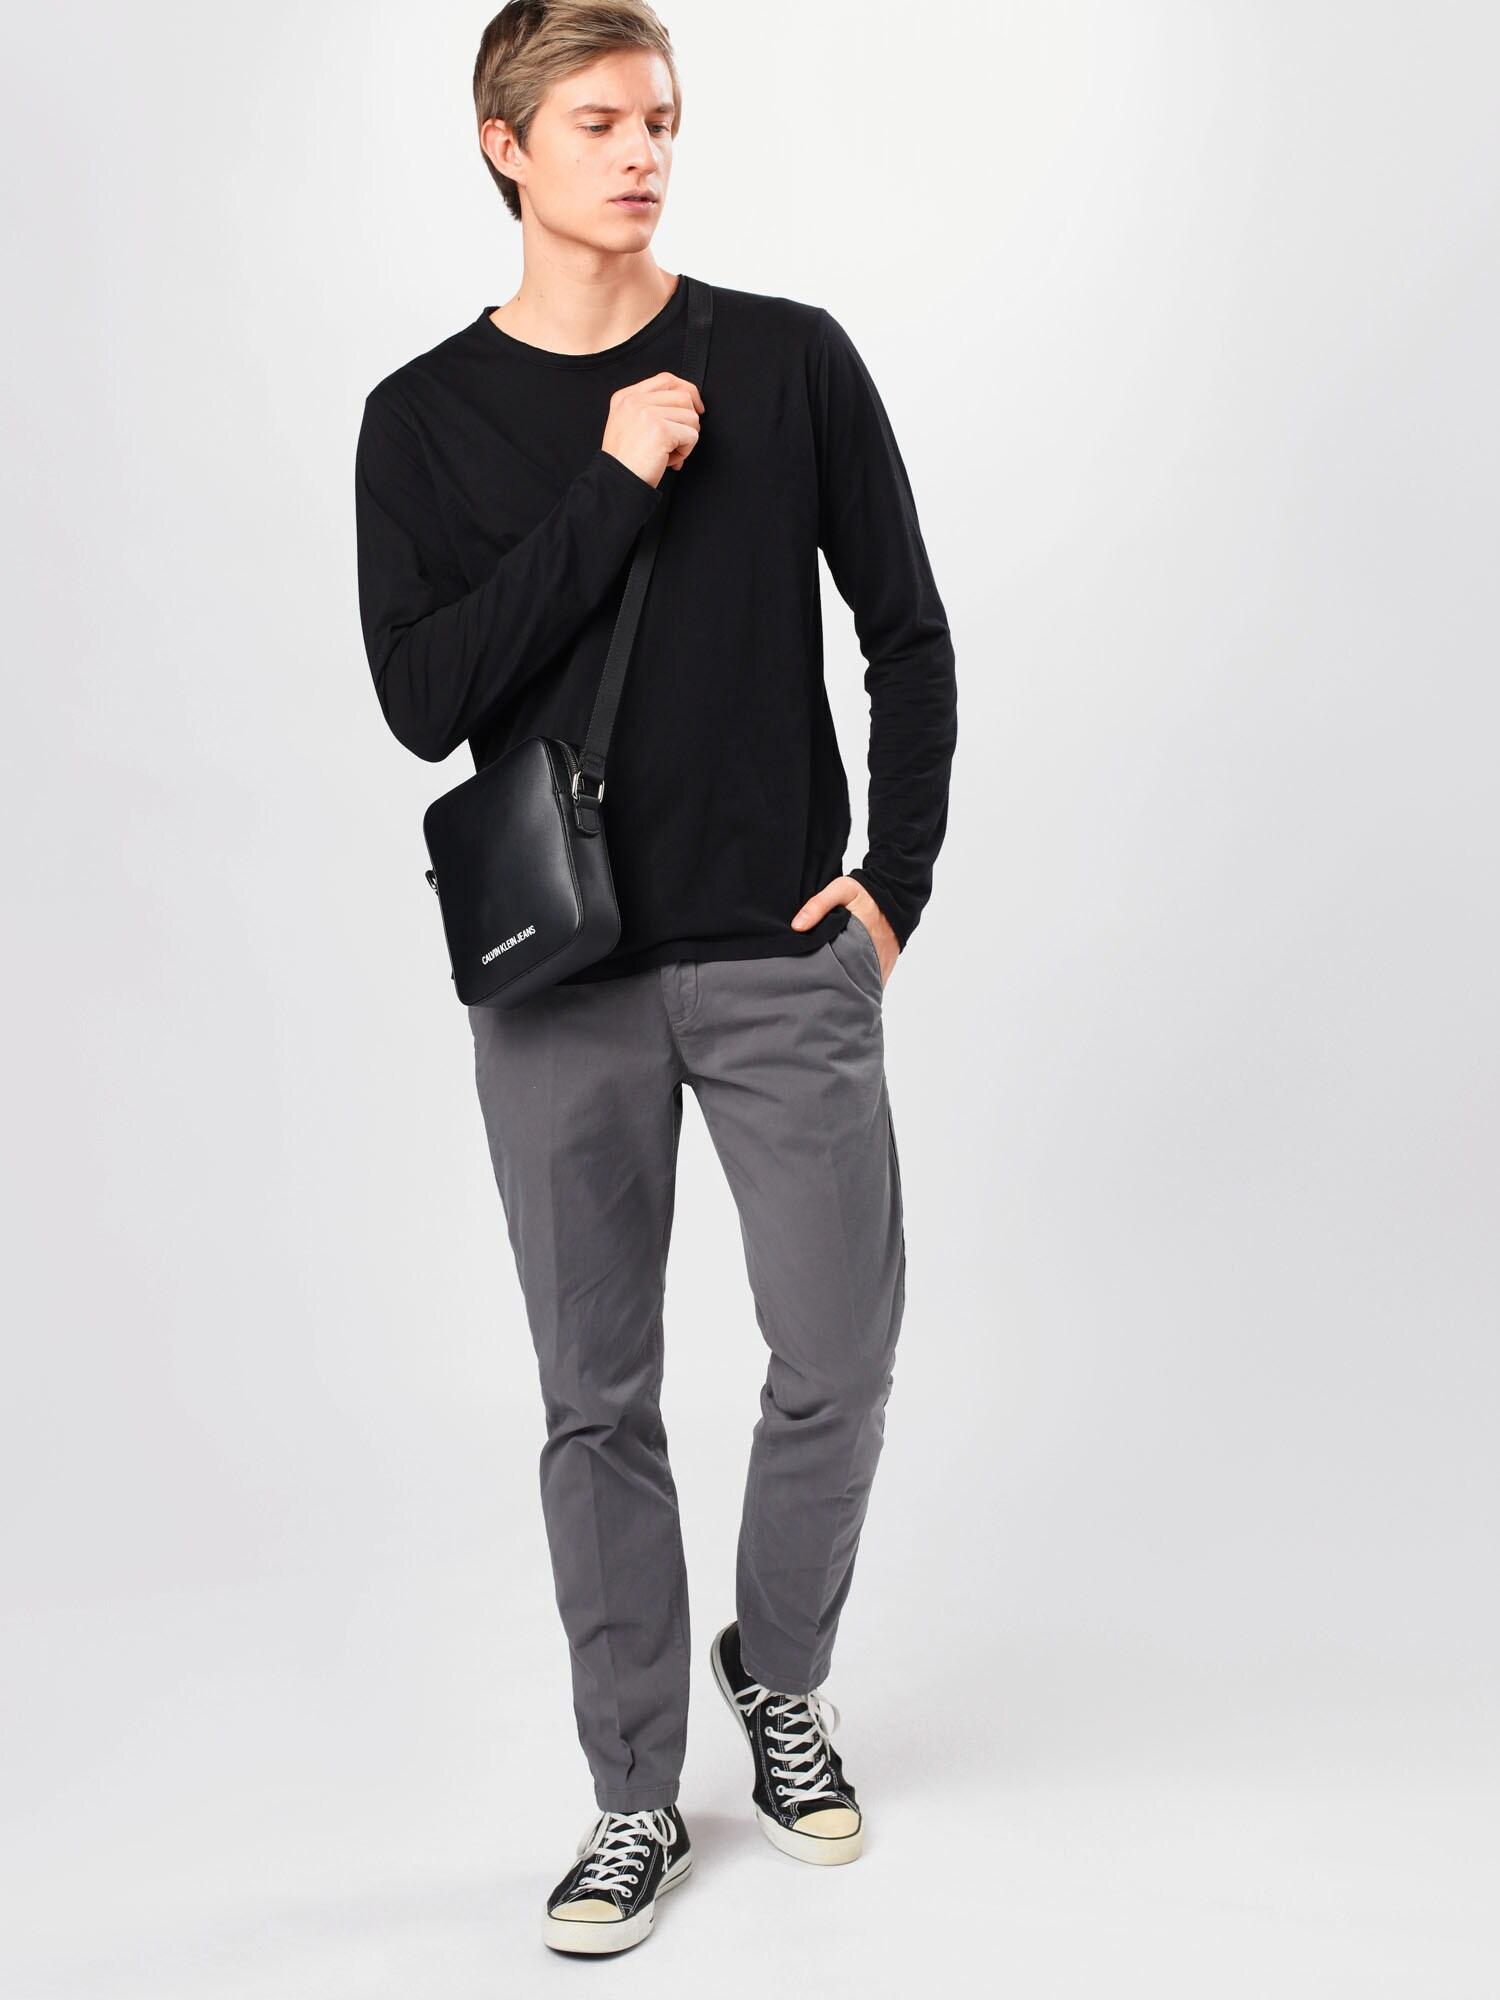 Marc O'Polo Chino nohavice  sivá.